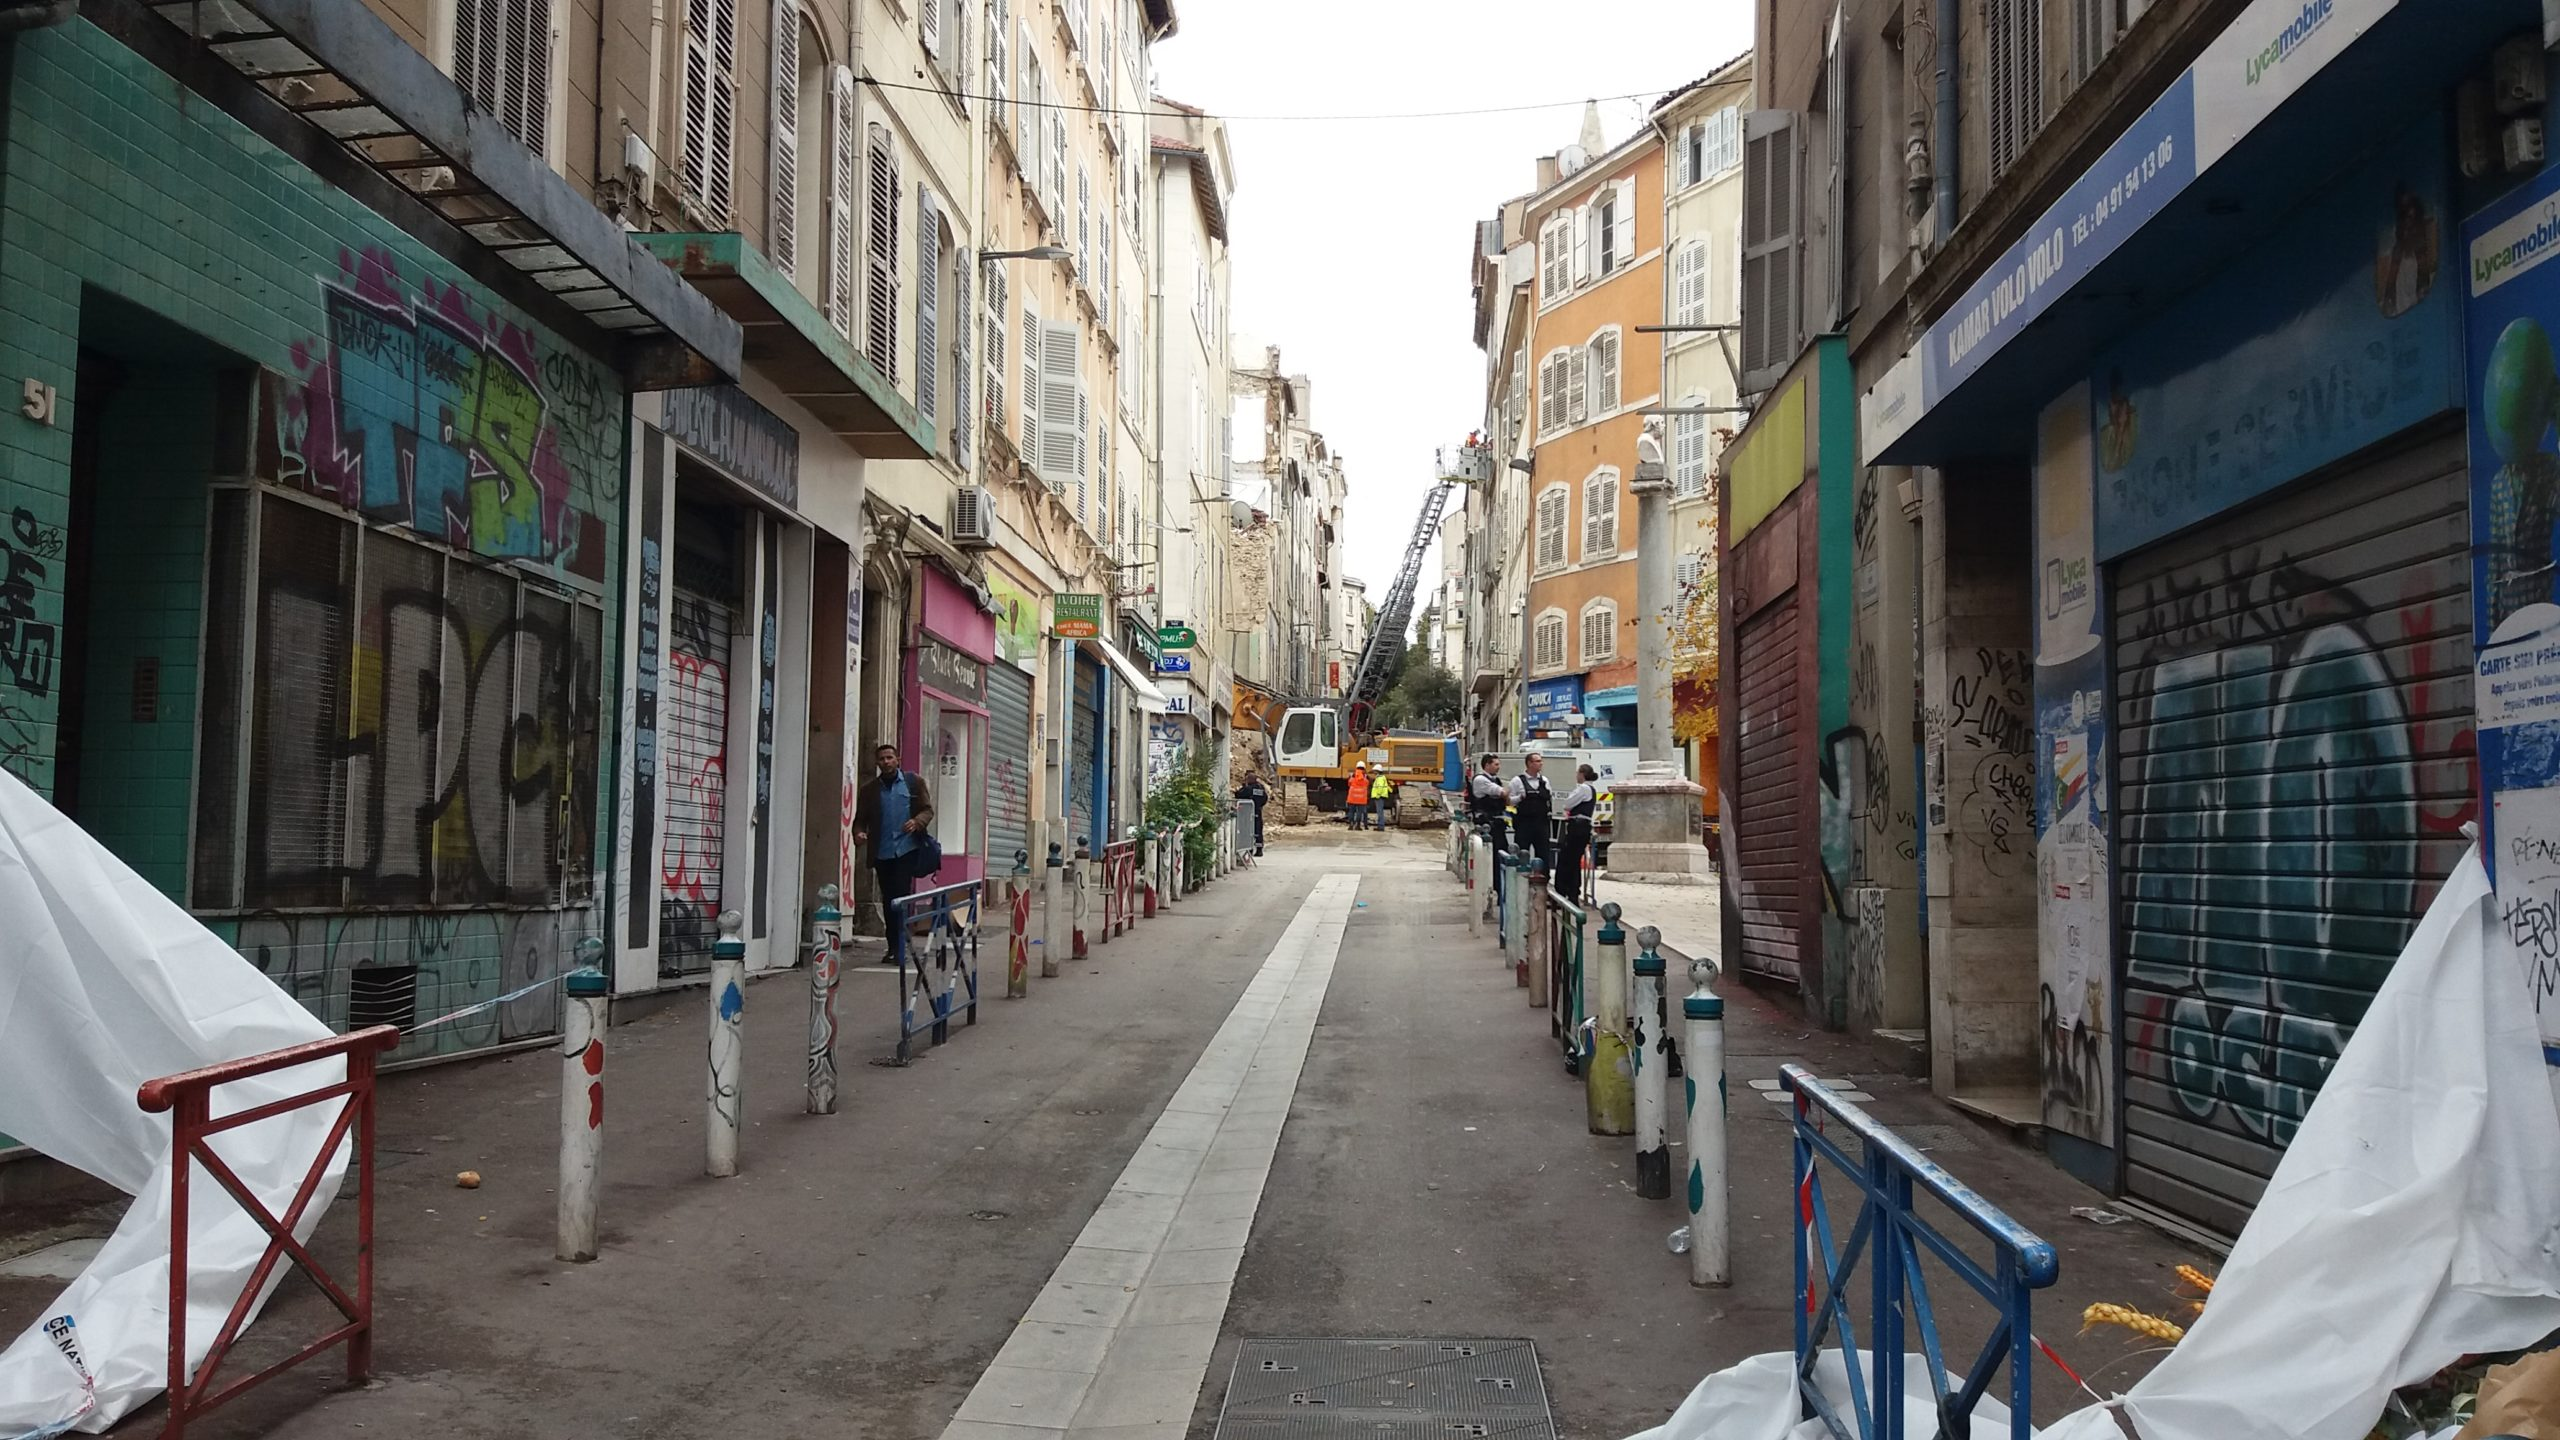 Mar, rue d'aubagne